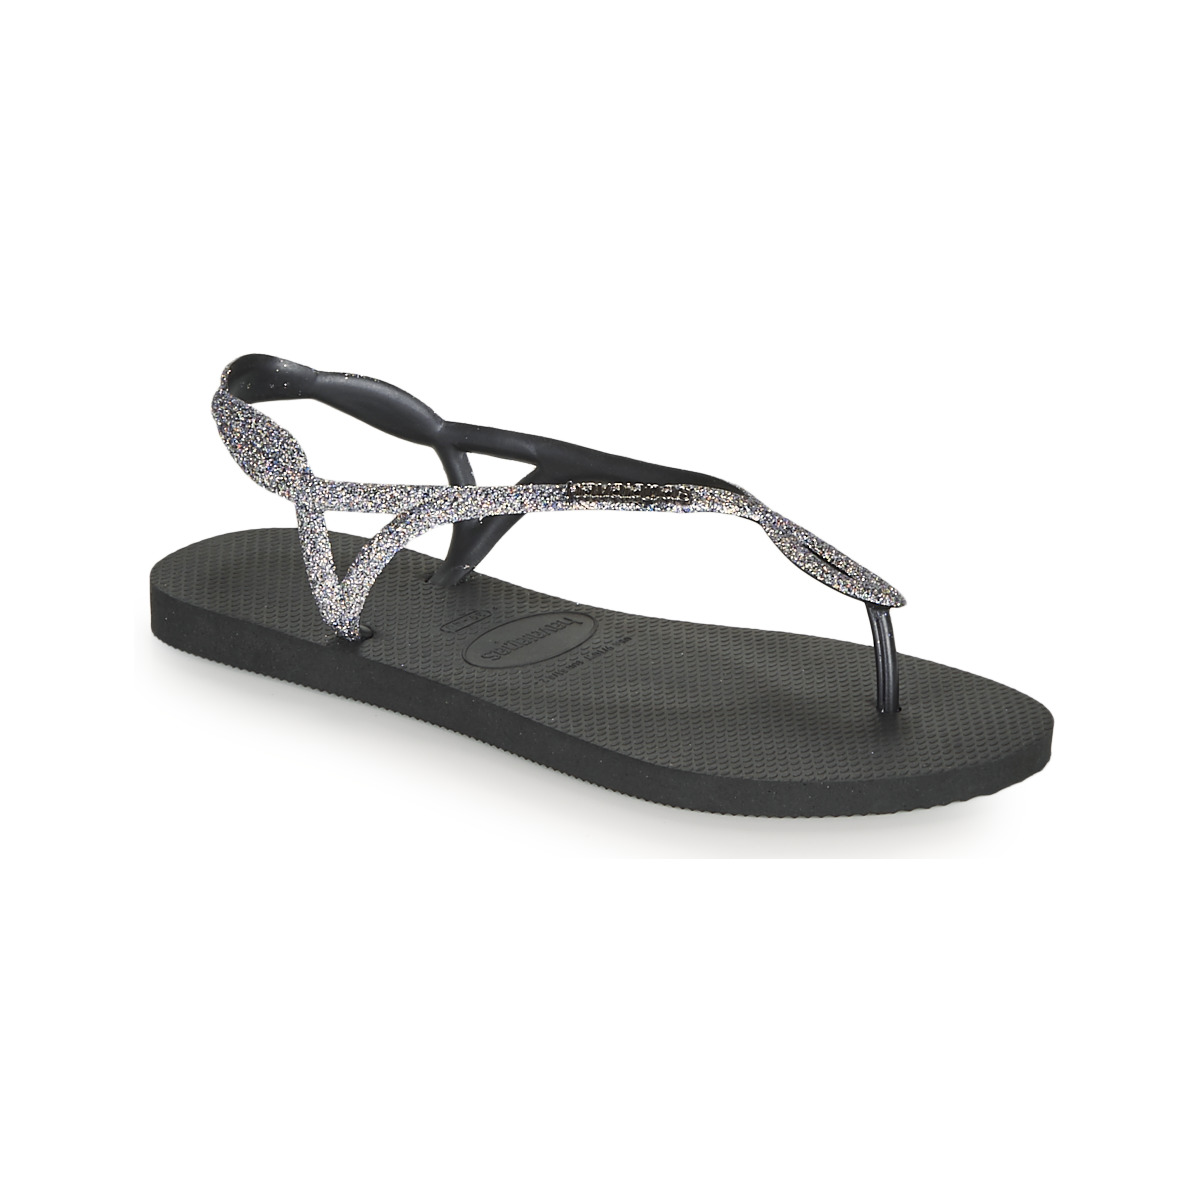 Havaianas Luna Black Womens Sandals